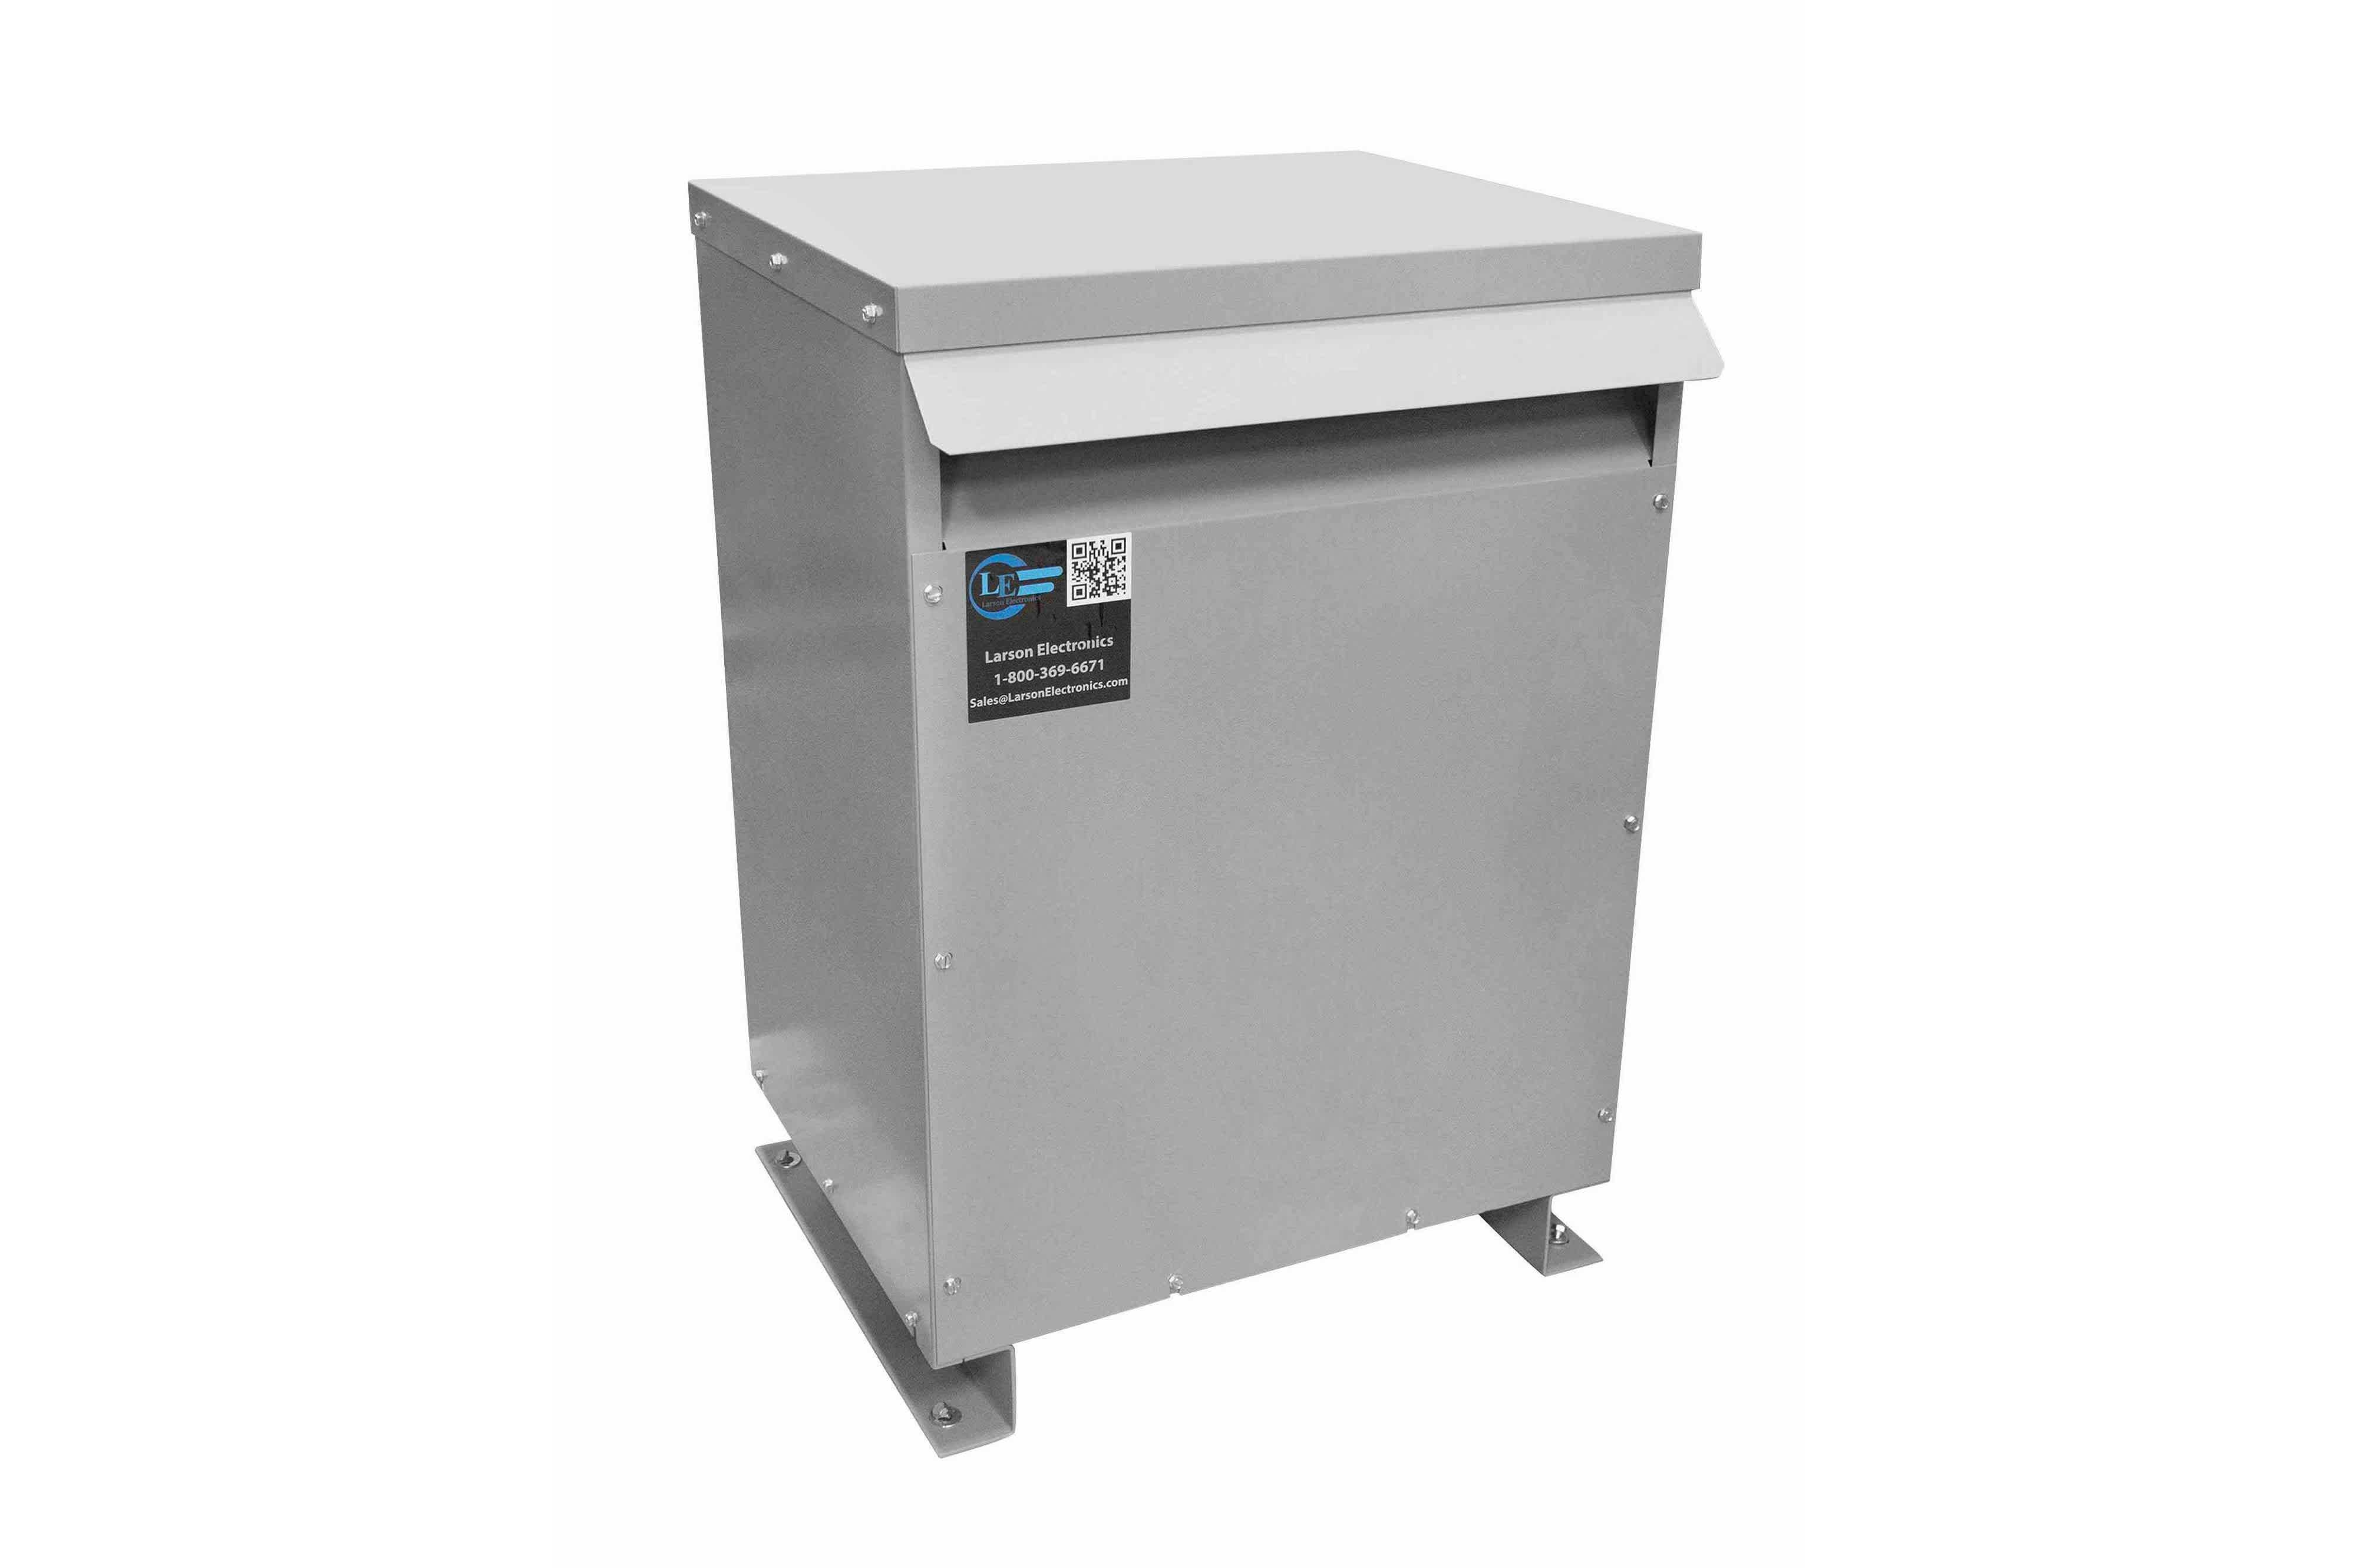 38 kVA 3PH Isolation Transformer, 575V Wye Primary, 240V/120 Delta Secondary, N3R, Ventilated, 60 Hz